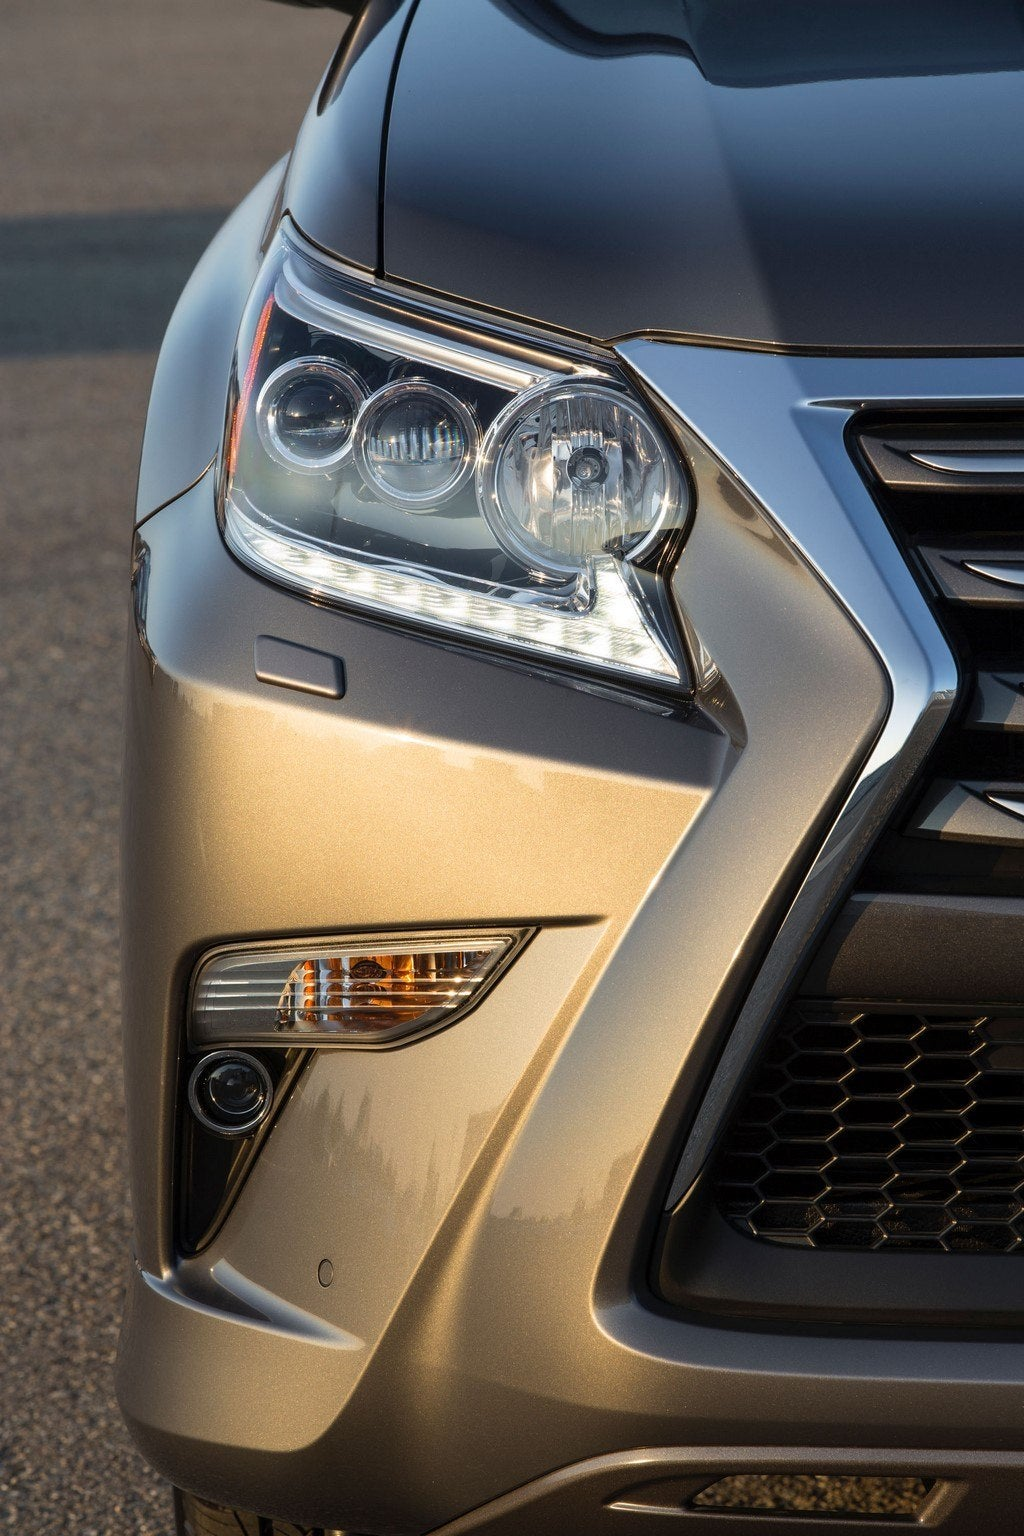 2014 Lexus GX 460 head light